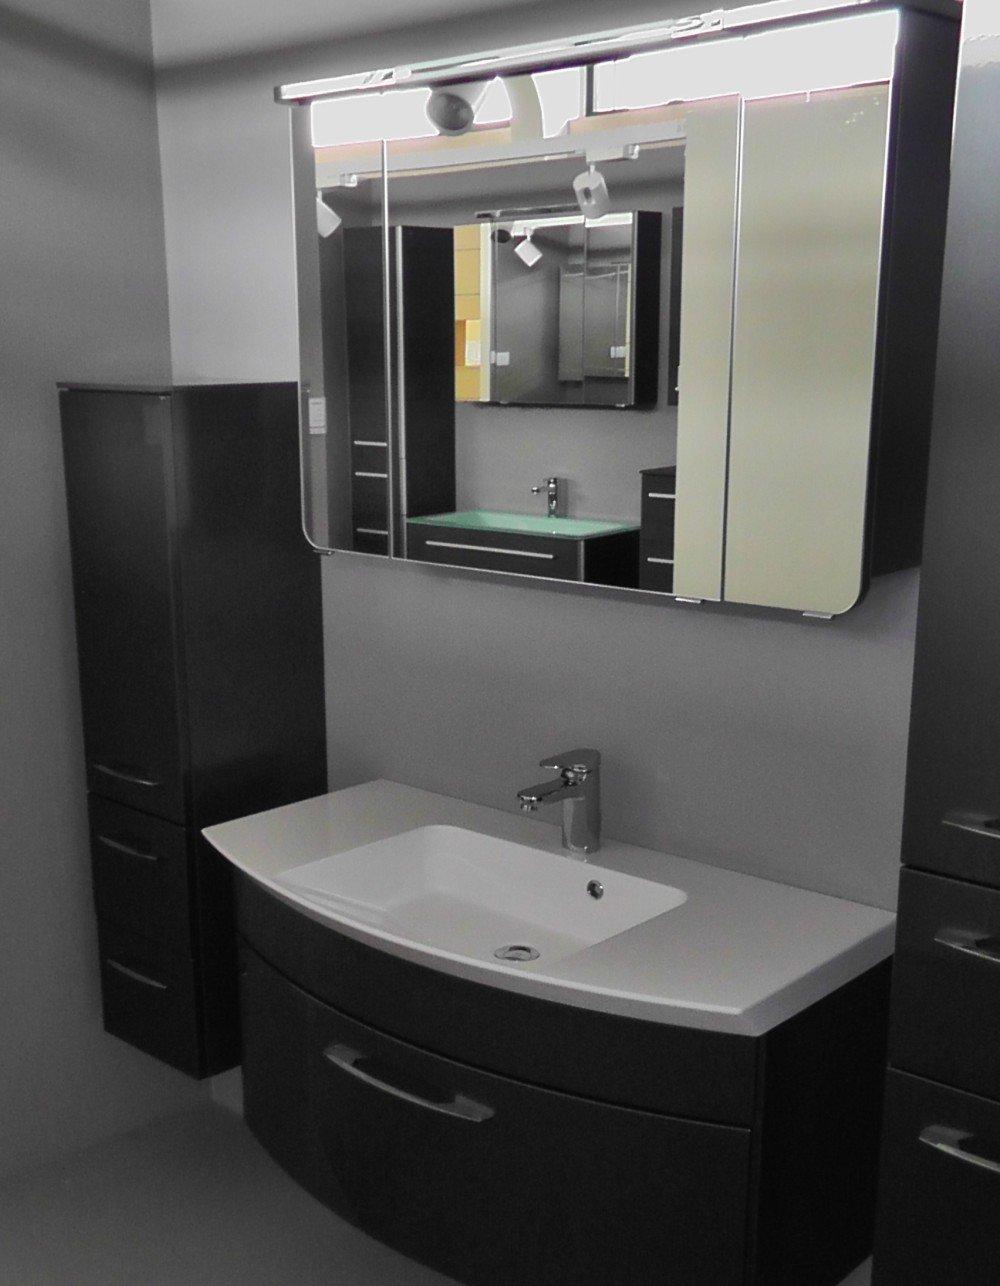 sie suchen aquarell vancouver badm bel ersatzteile dann. Black Bedroom Furniture Sets. Home Design Ideas